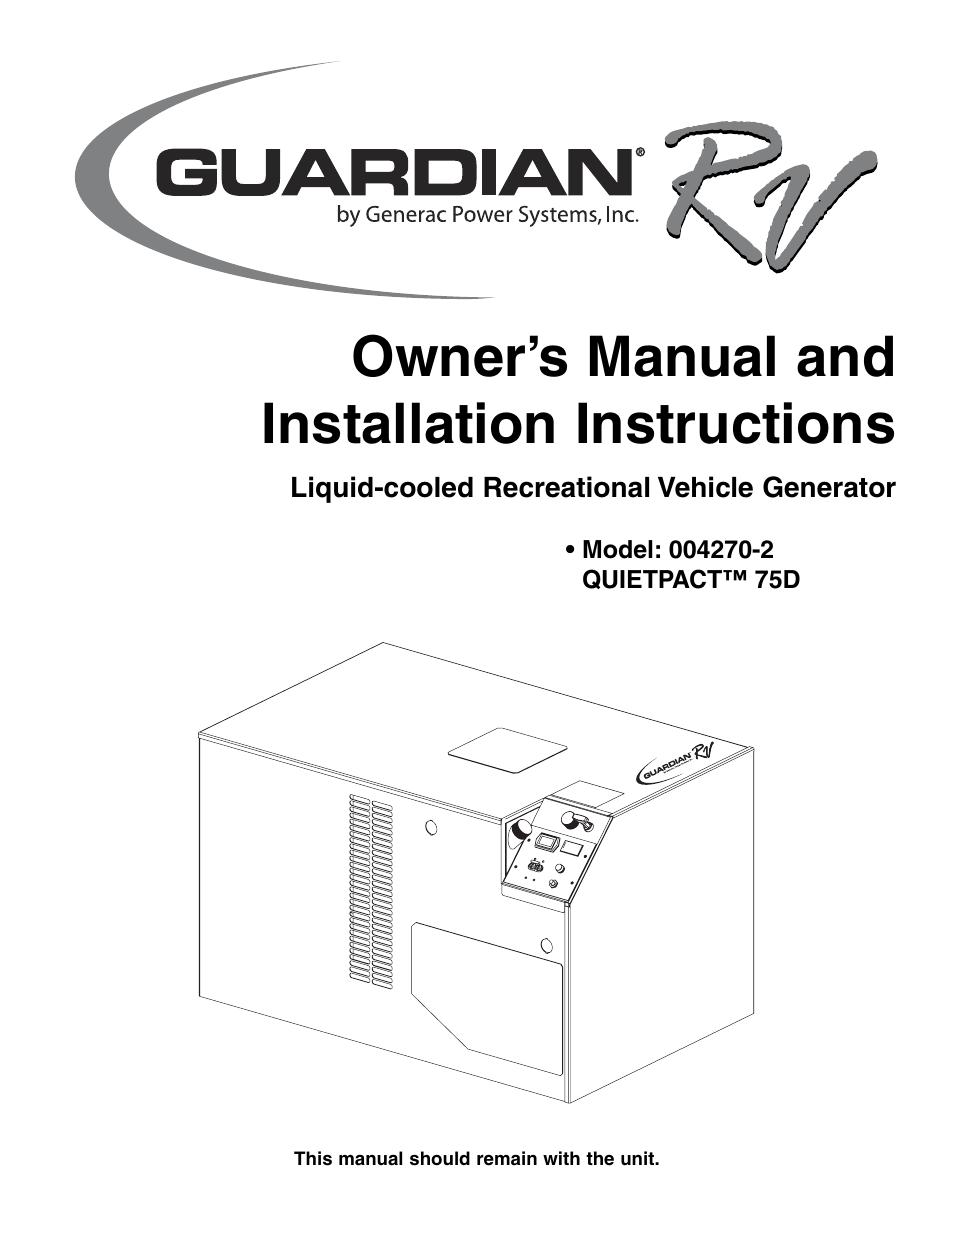 Generac Guardian Generator Installation Manual Manual Guide